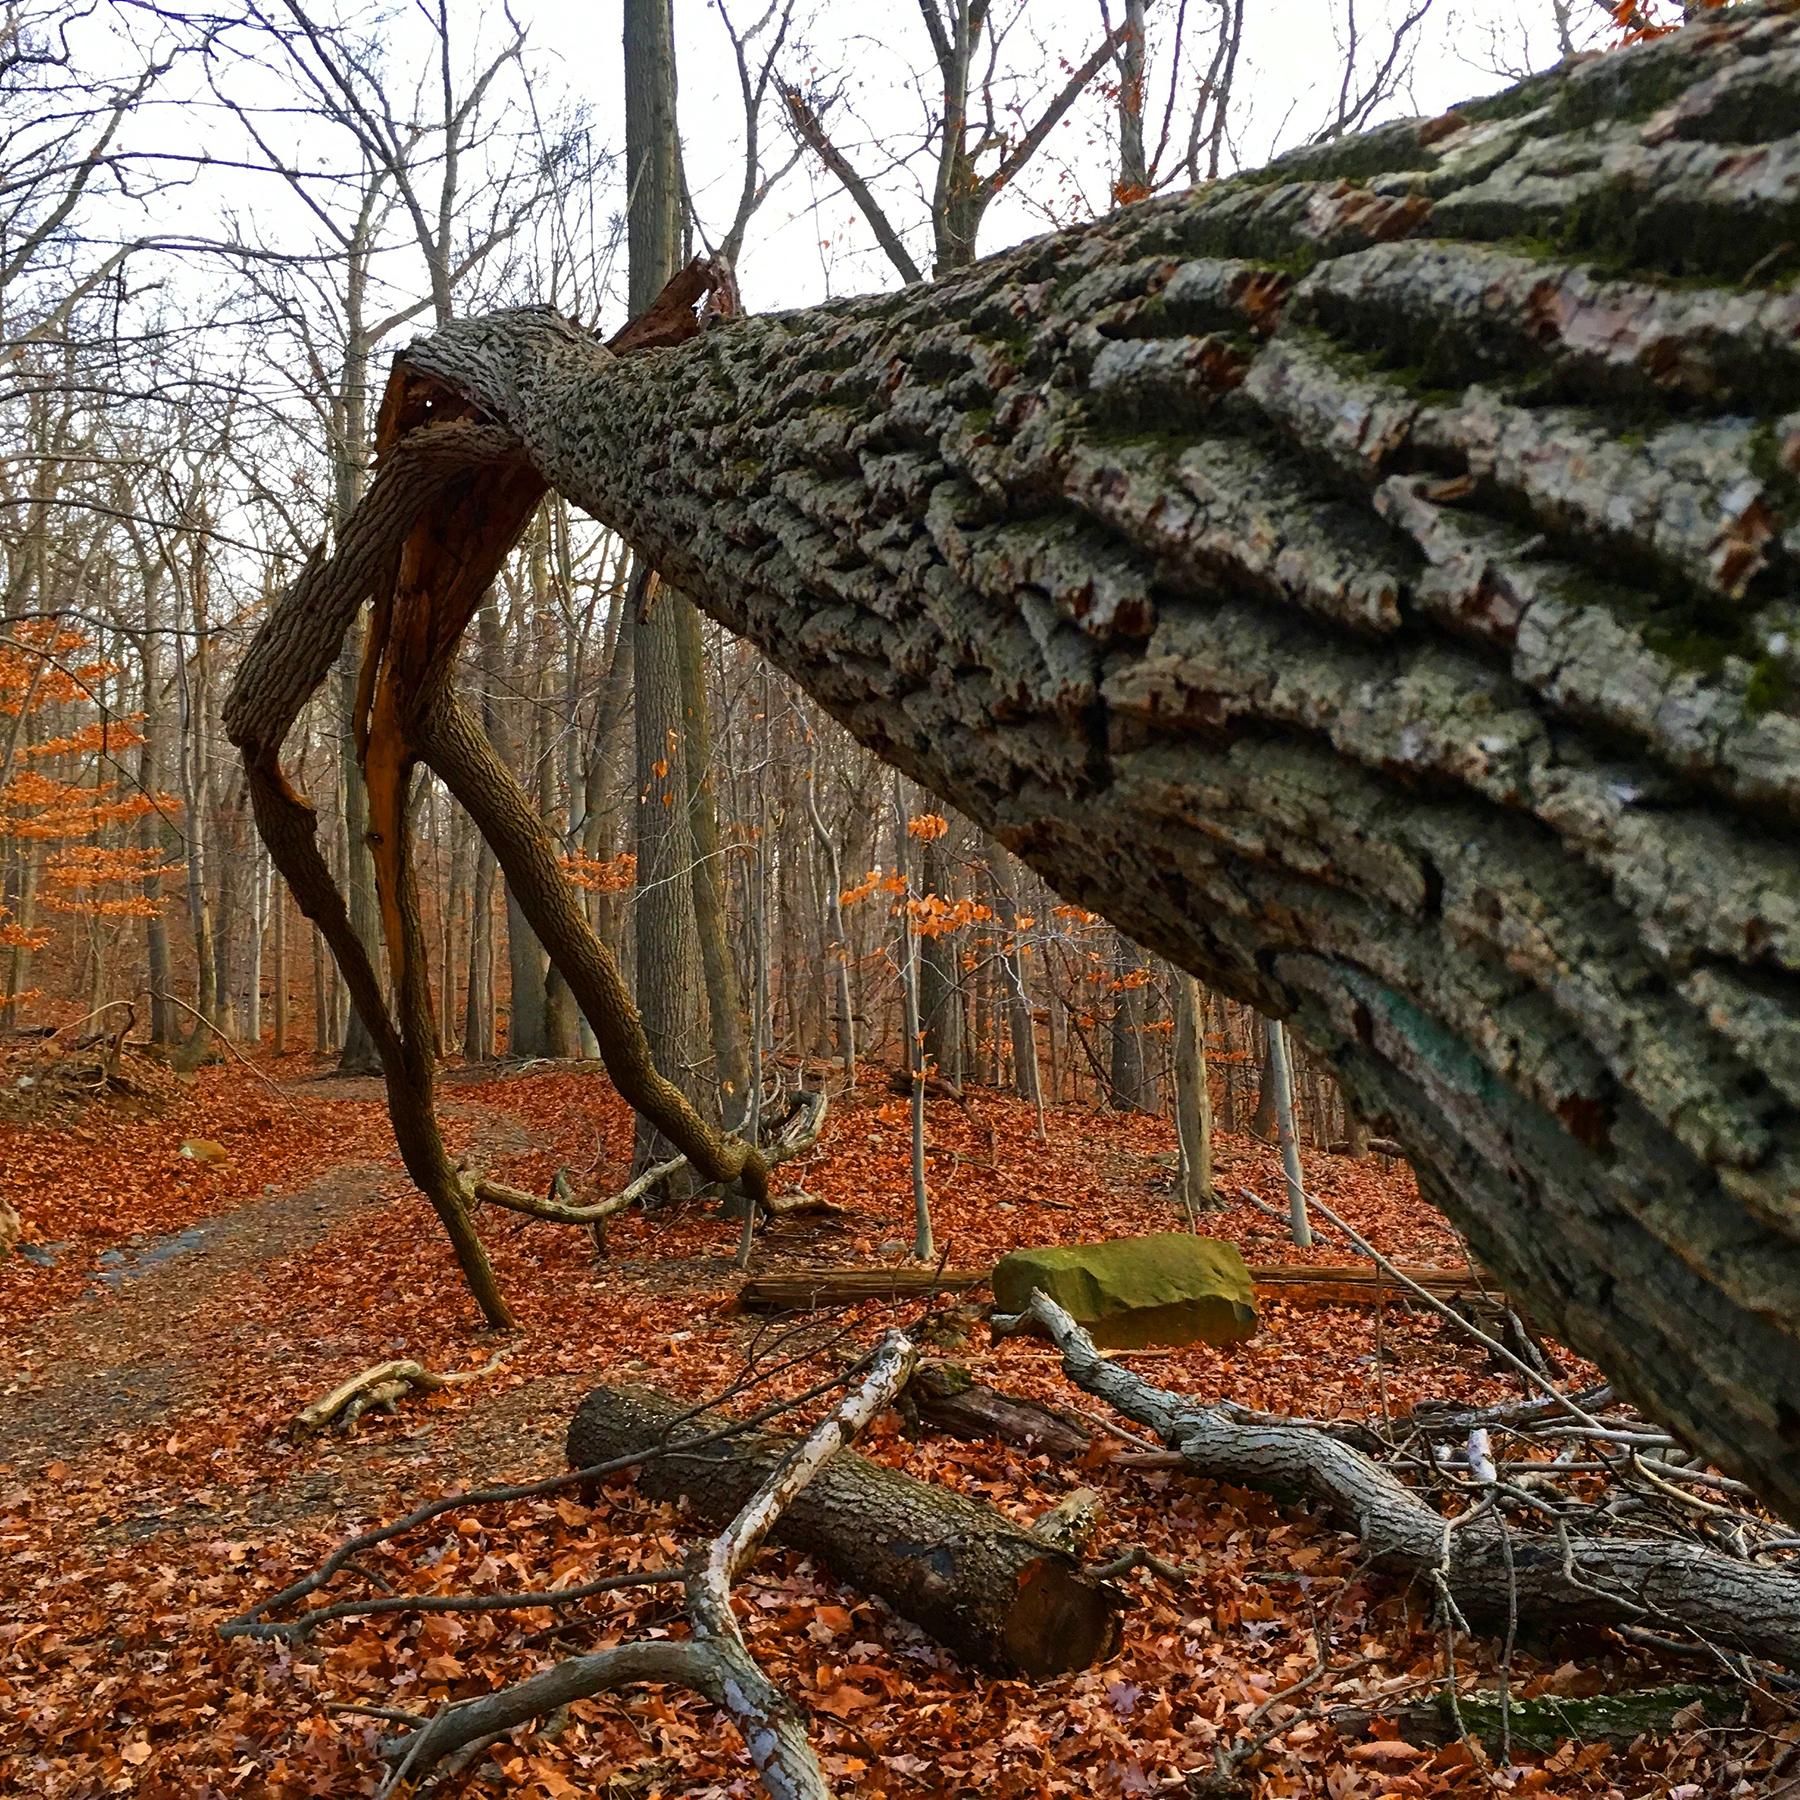 Gayle_Kirschenbaum_NaturesView_TreeMan_2.JPG